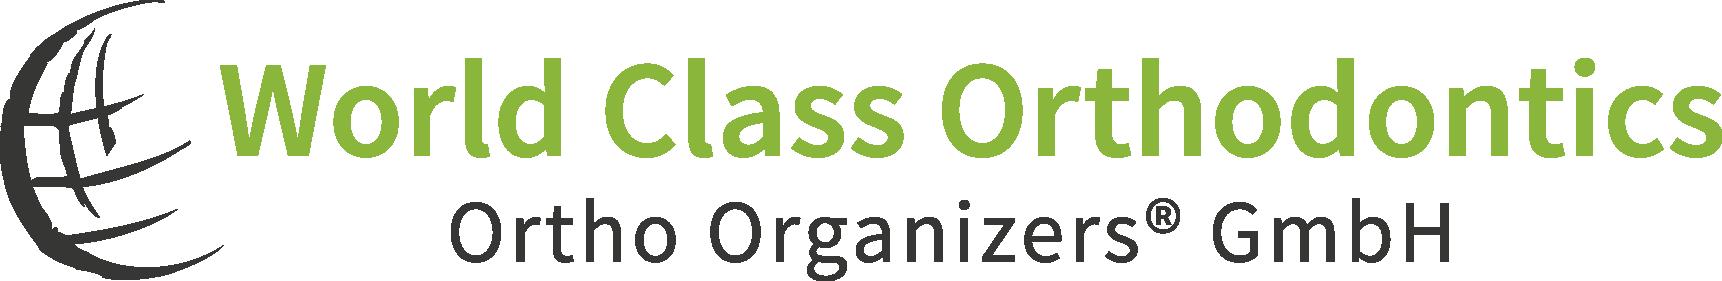 World Class Orthodontics / Ortho Organizers GmbH